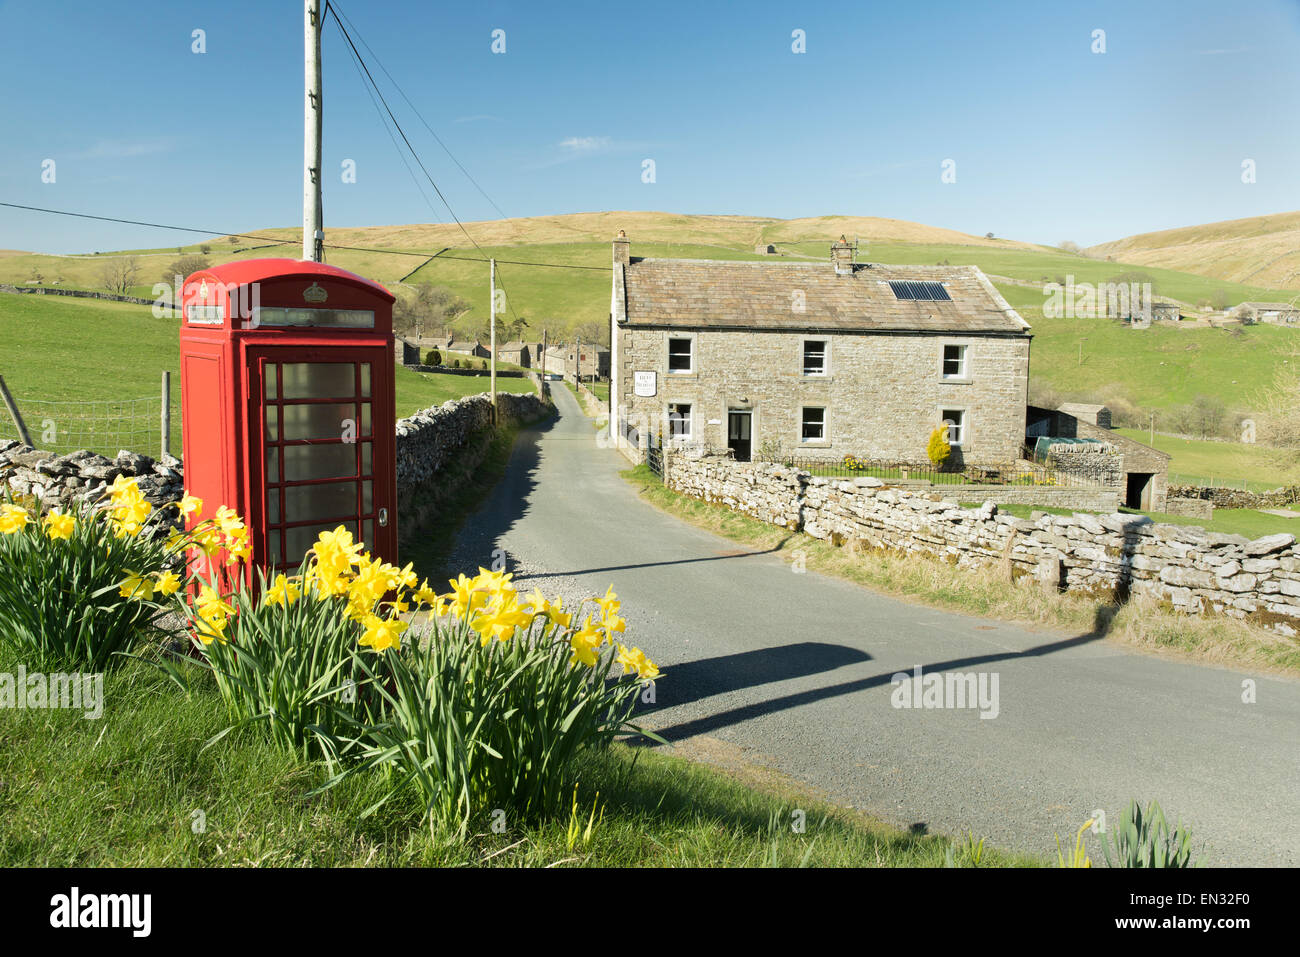 Keld & Red Telephone Box April 2015 - Stock Image